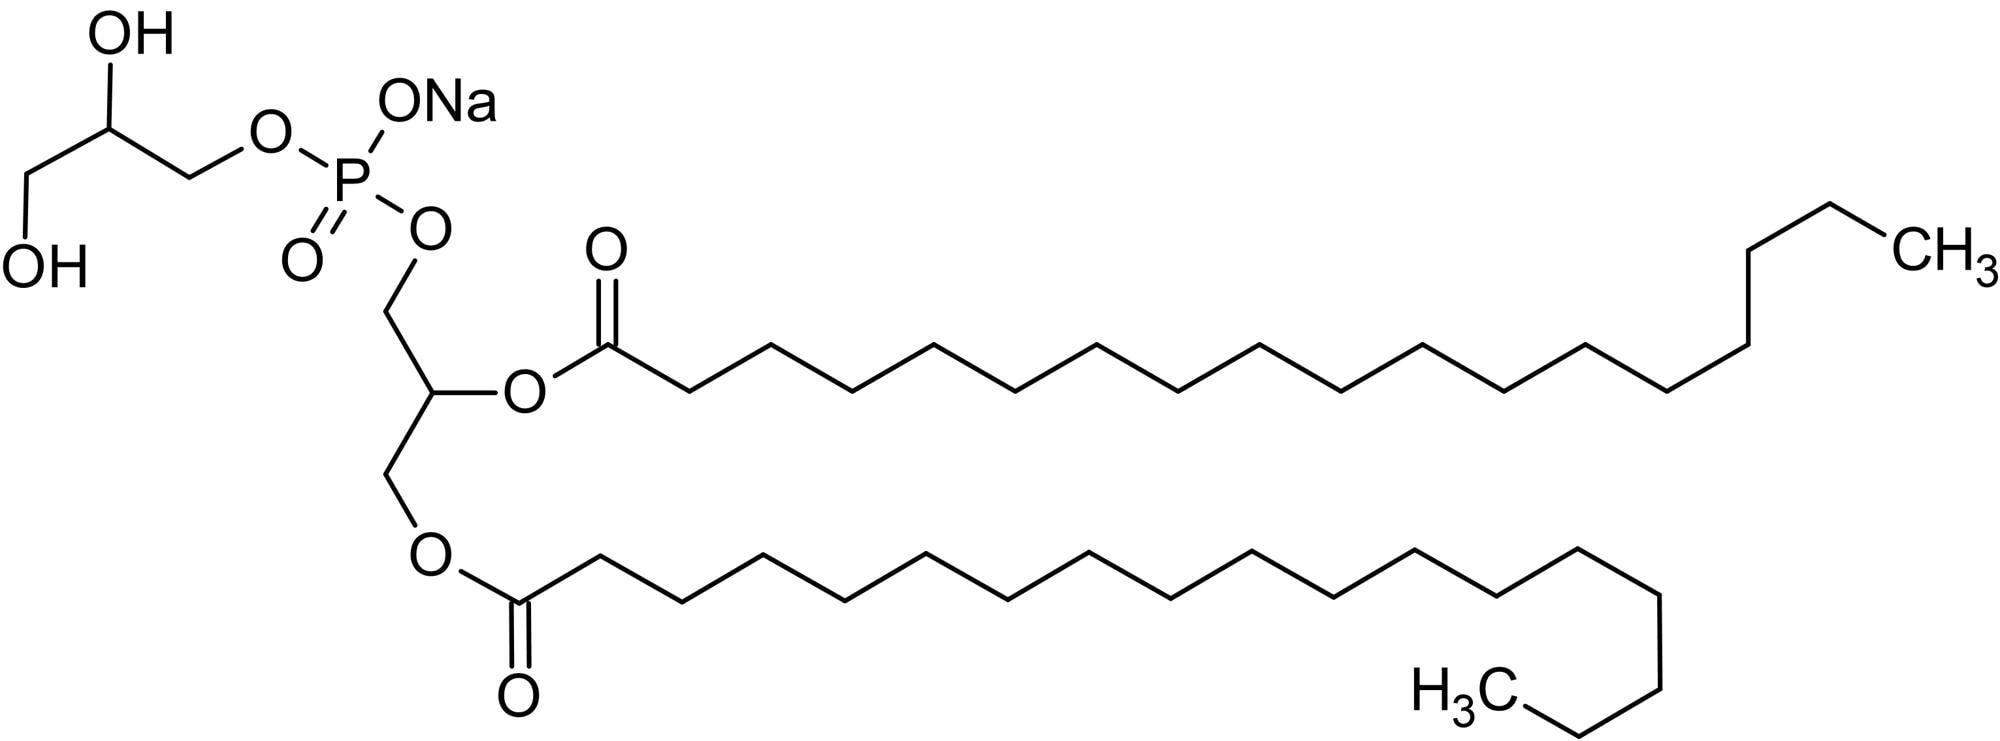 Chemical Structure - 1,2-Distearoyl-sn-glycero-3-phosphorylglycerol sodium salt (DSPG), Phosphorylglycerol (ab143954)